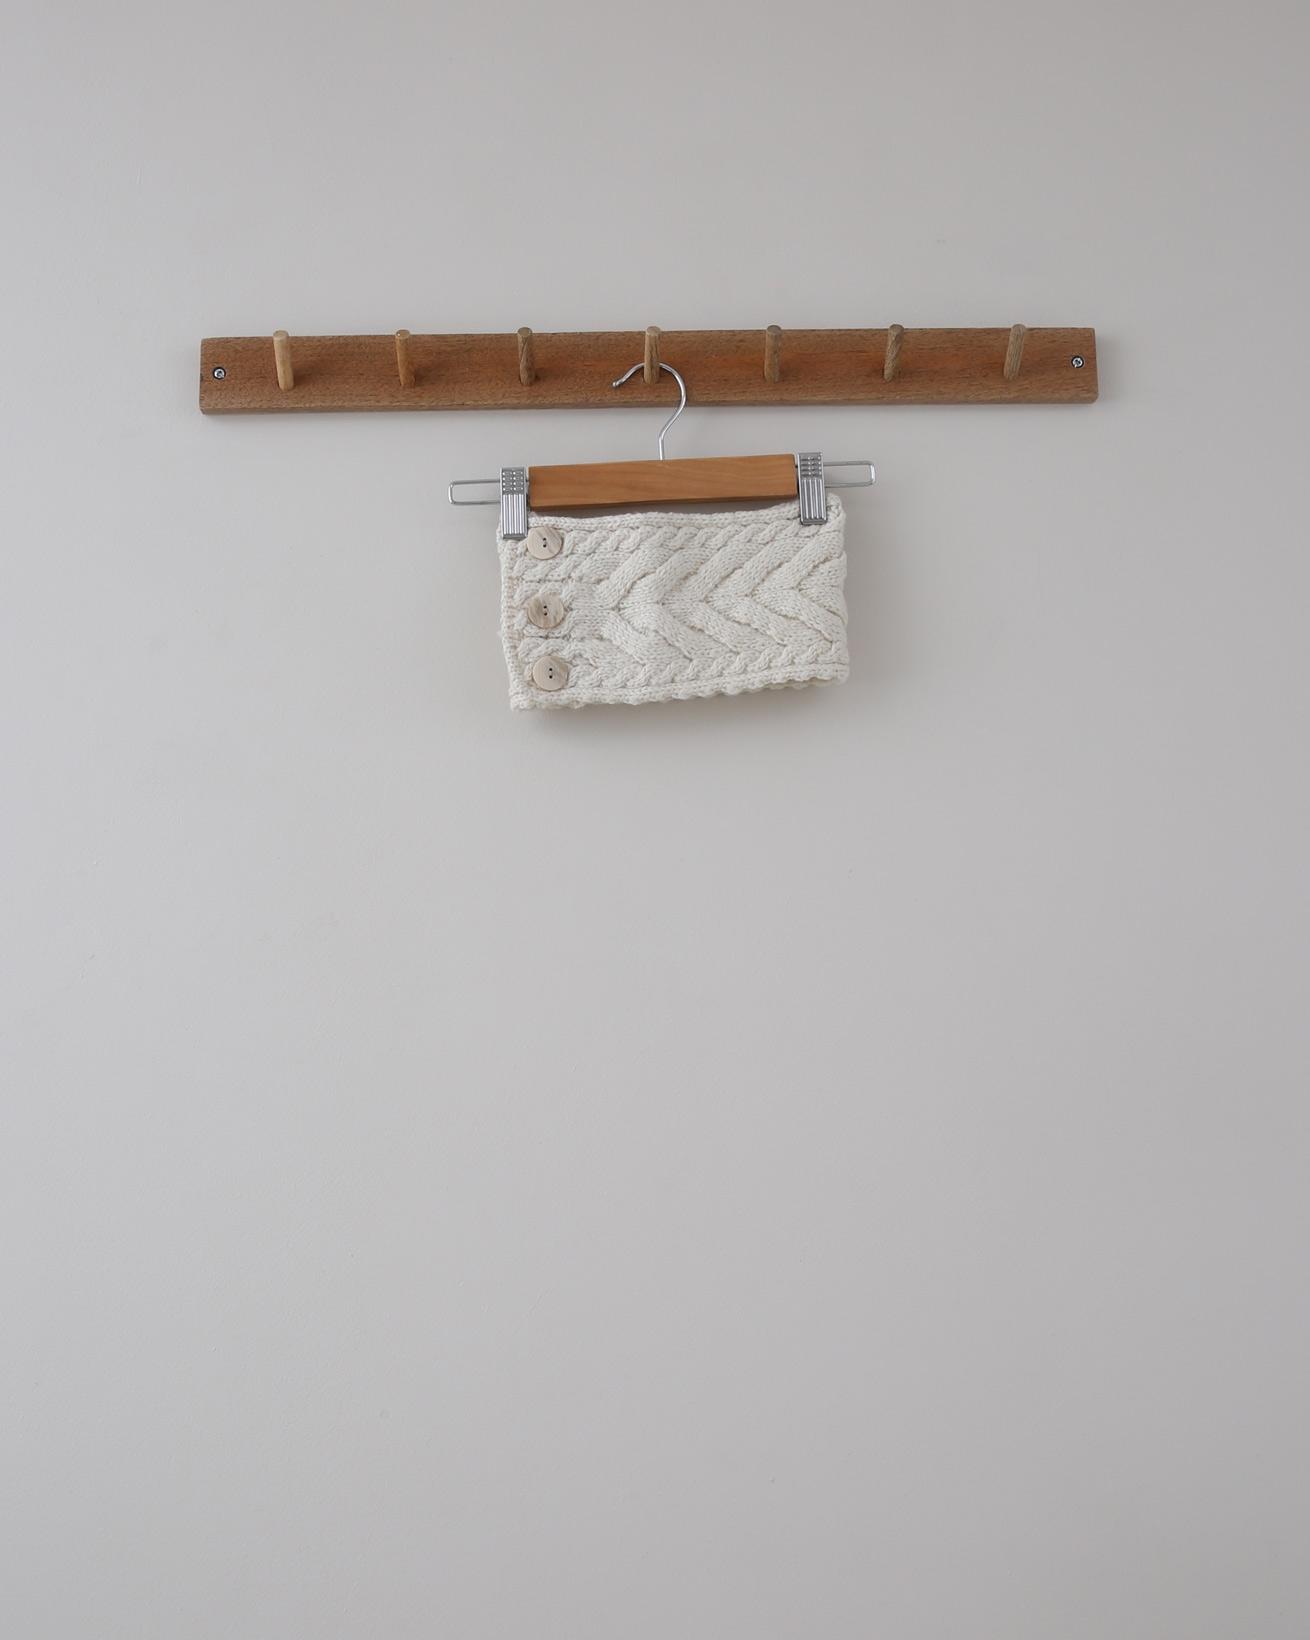 Aran Cable Button Headband - 12cm deep x 48cm - Aran Oatmeal - 1378